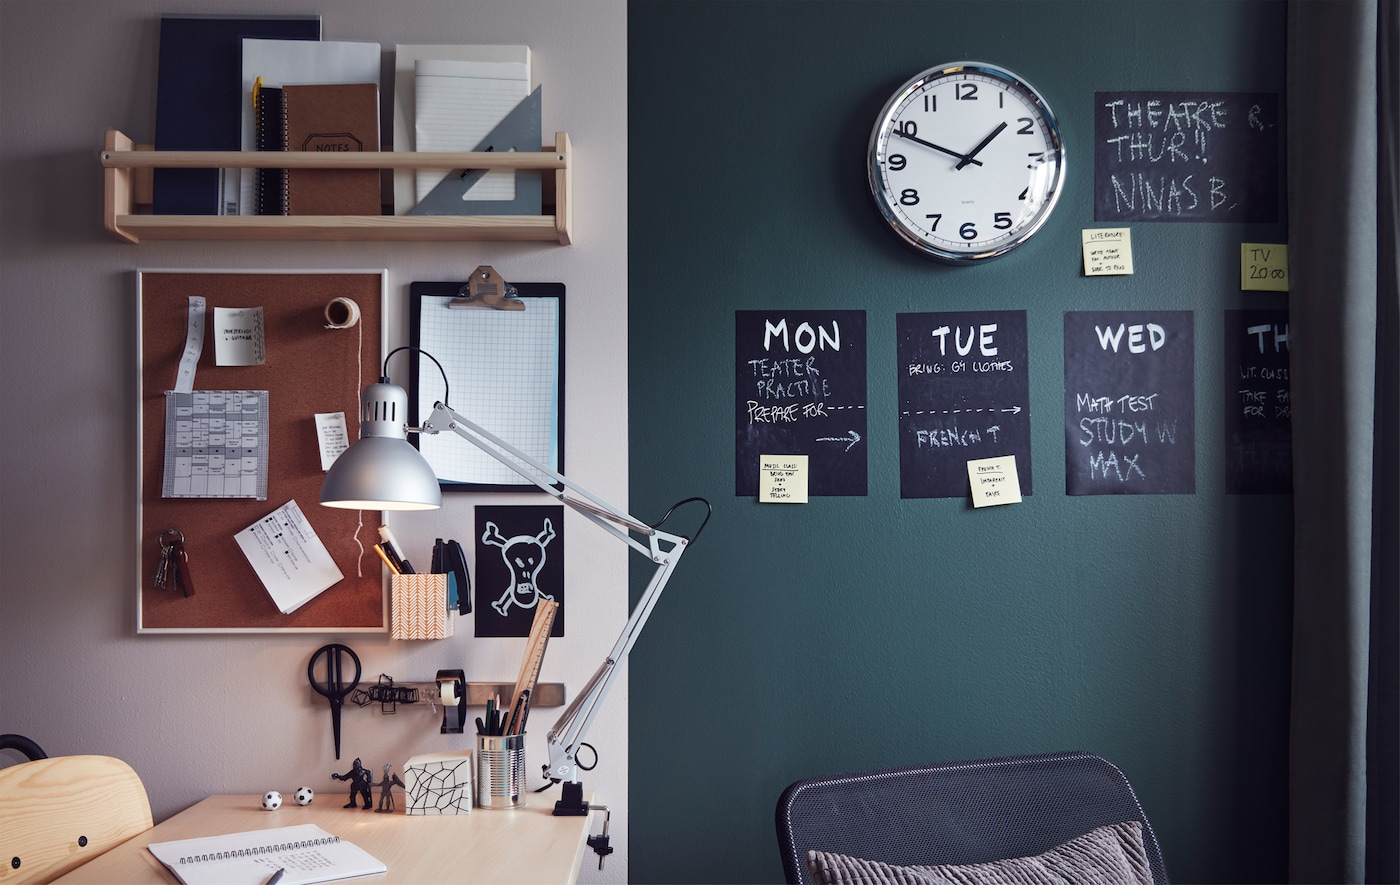 Teen bedroom inspiration - IKEA